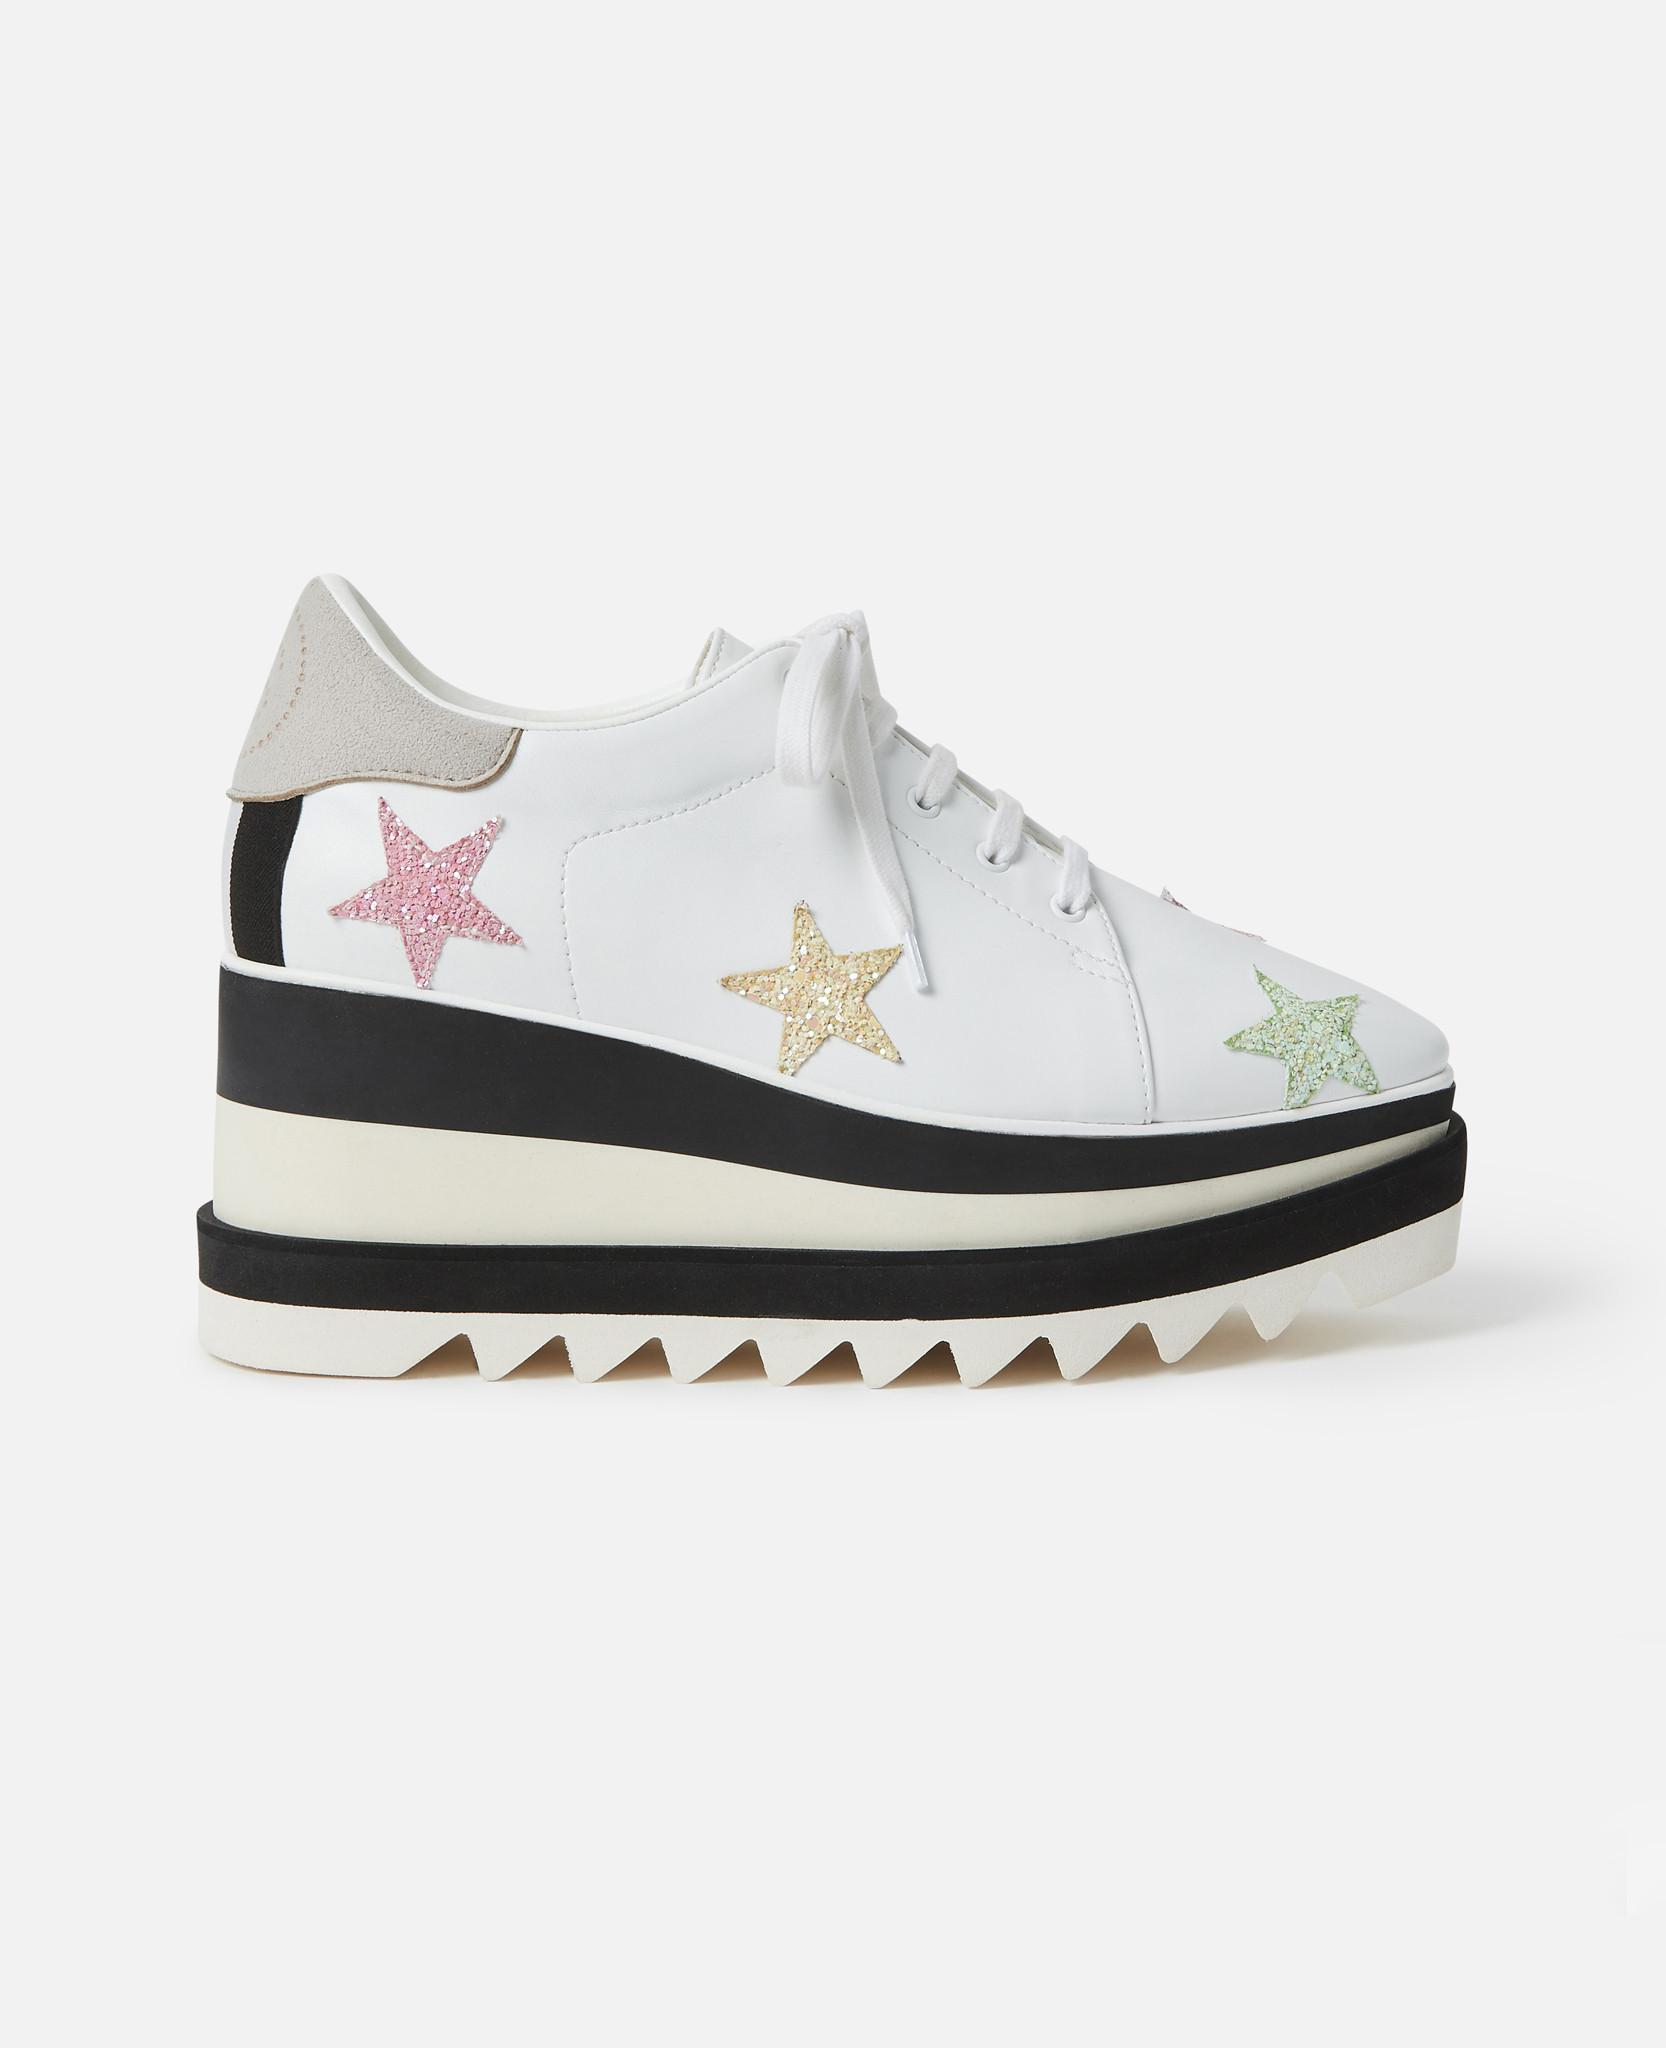 00c05e9bea5b Lyst - Stella McCartney Sneak-elyse Pastel Stars in White